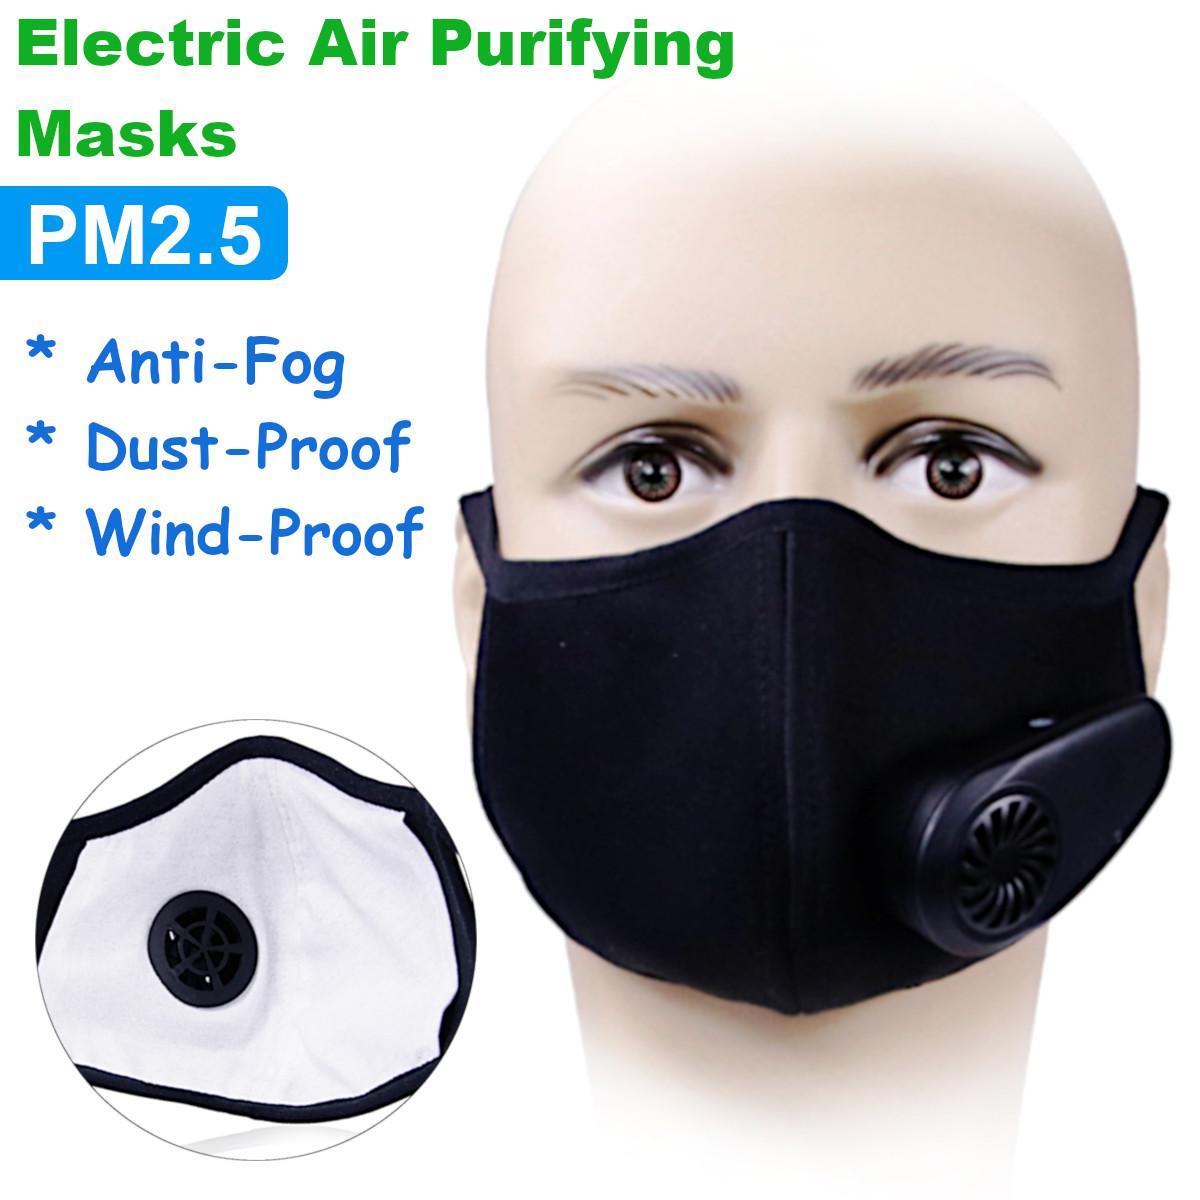 Fresh Pm2 Purifying N95 Smart Mask Supply Air Dust Pollution Anti Face Electric 5 Anti-fog